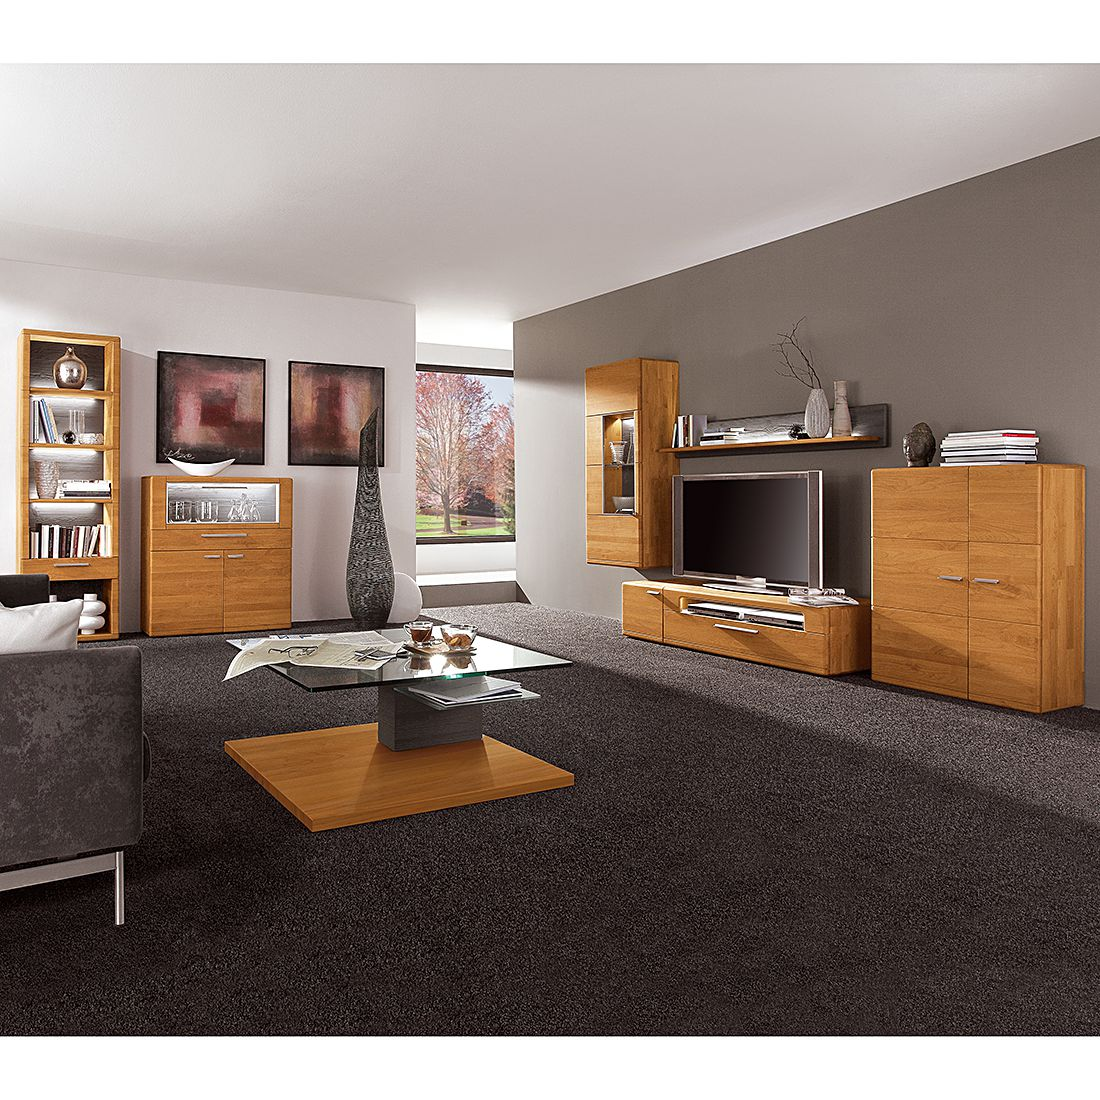 wohnwand curve i 4 teilig erle massiv ohne beleuchtung hartmann kaufen. Black Bedroom Furniture Sets. Home Design Ideas